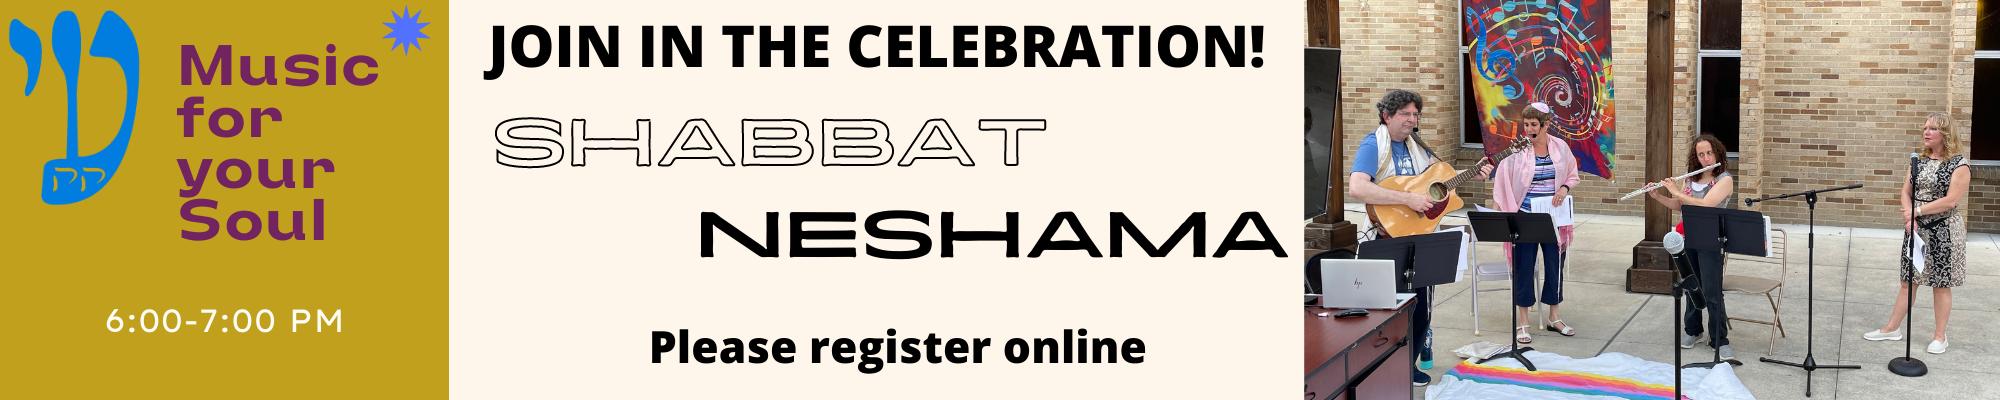 Banner Image for Shabbat Neshama